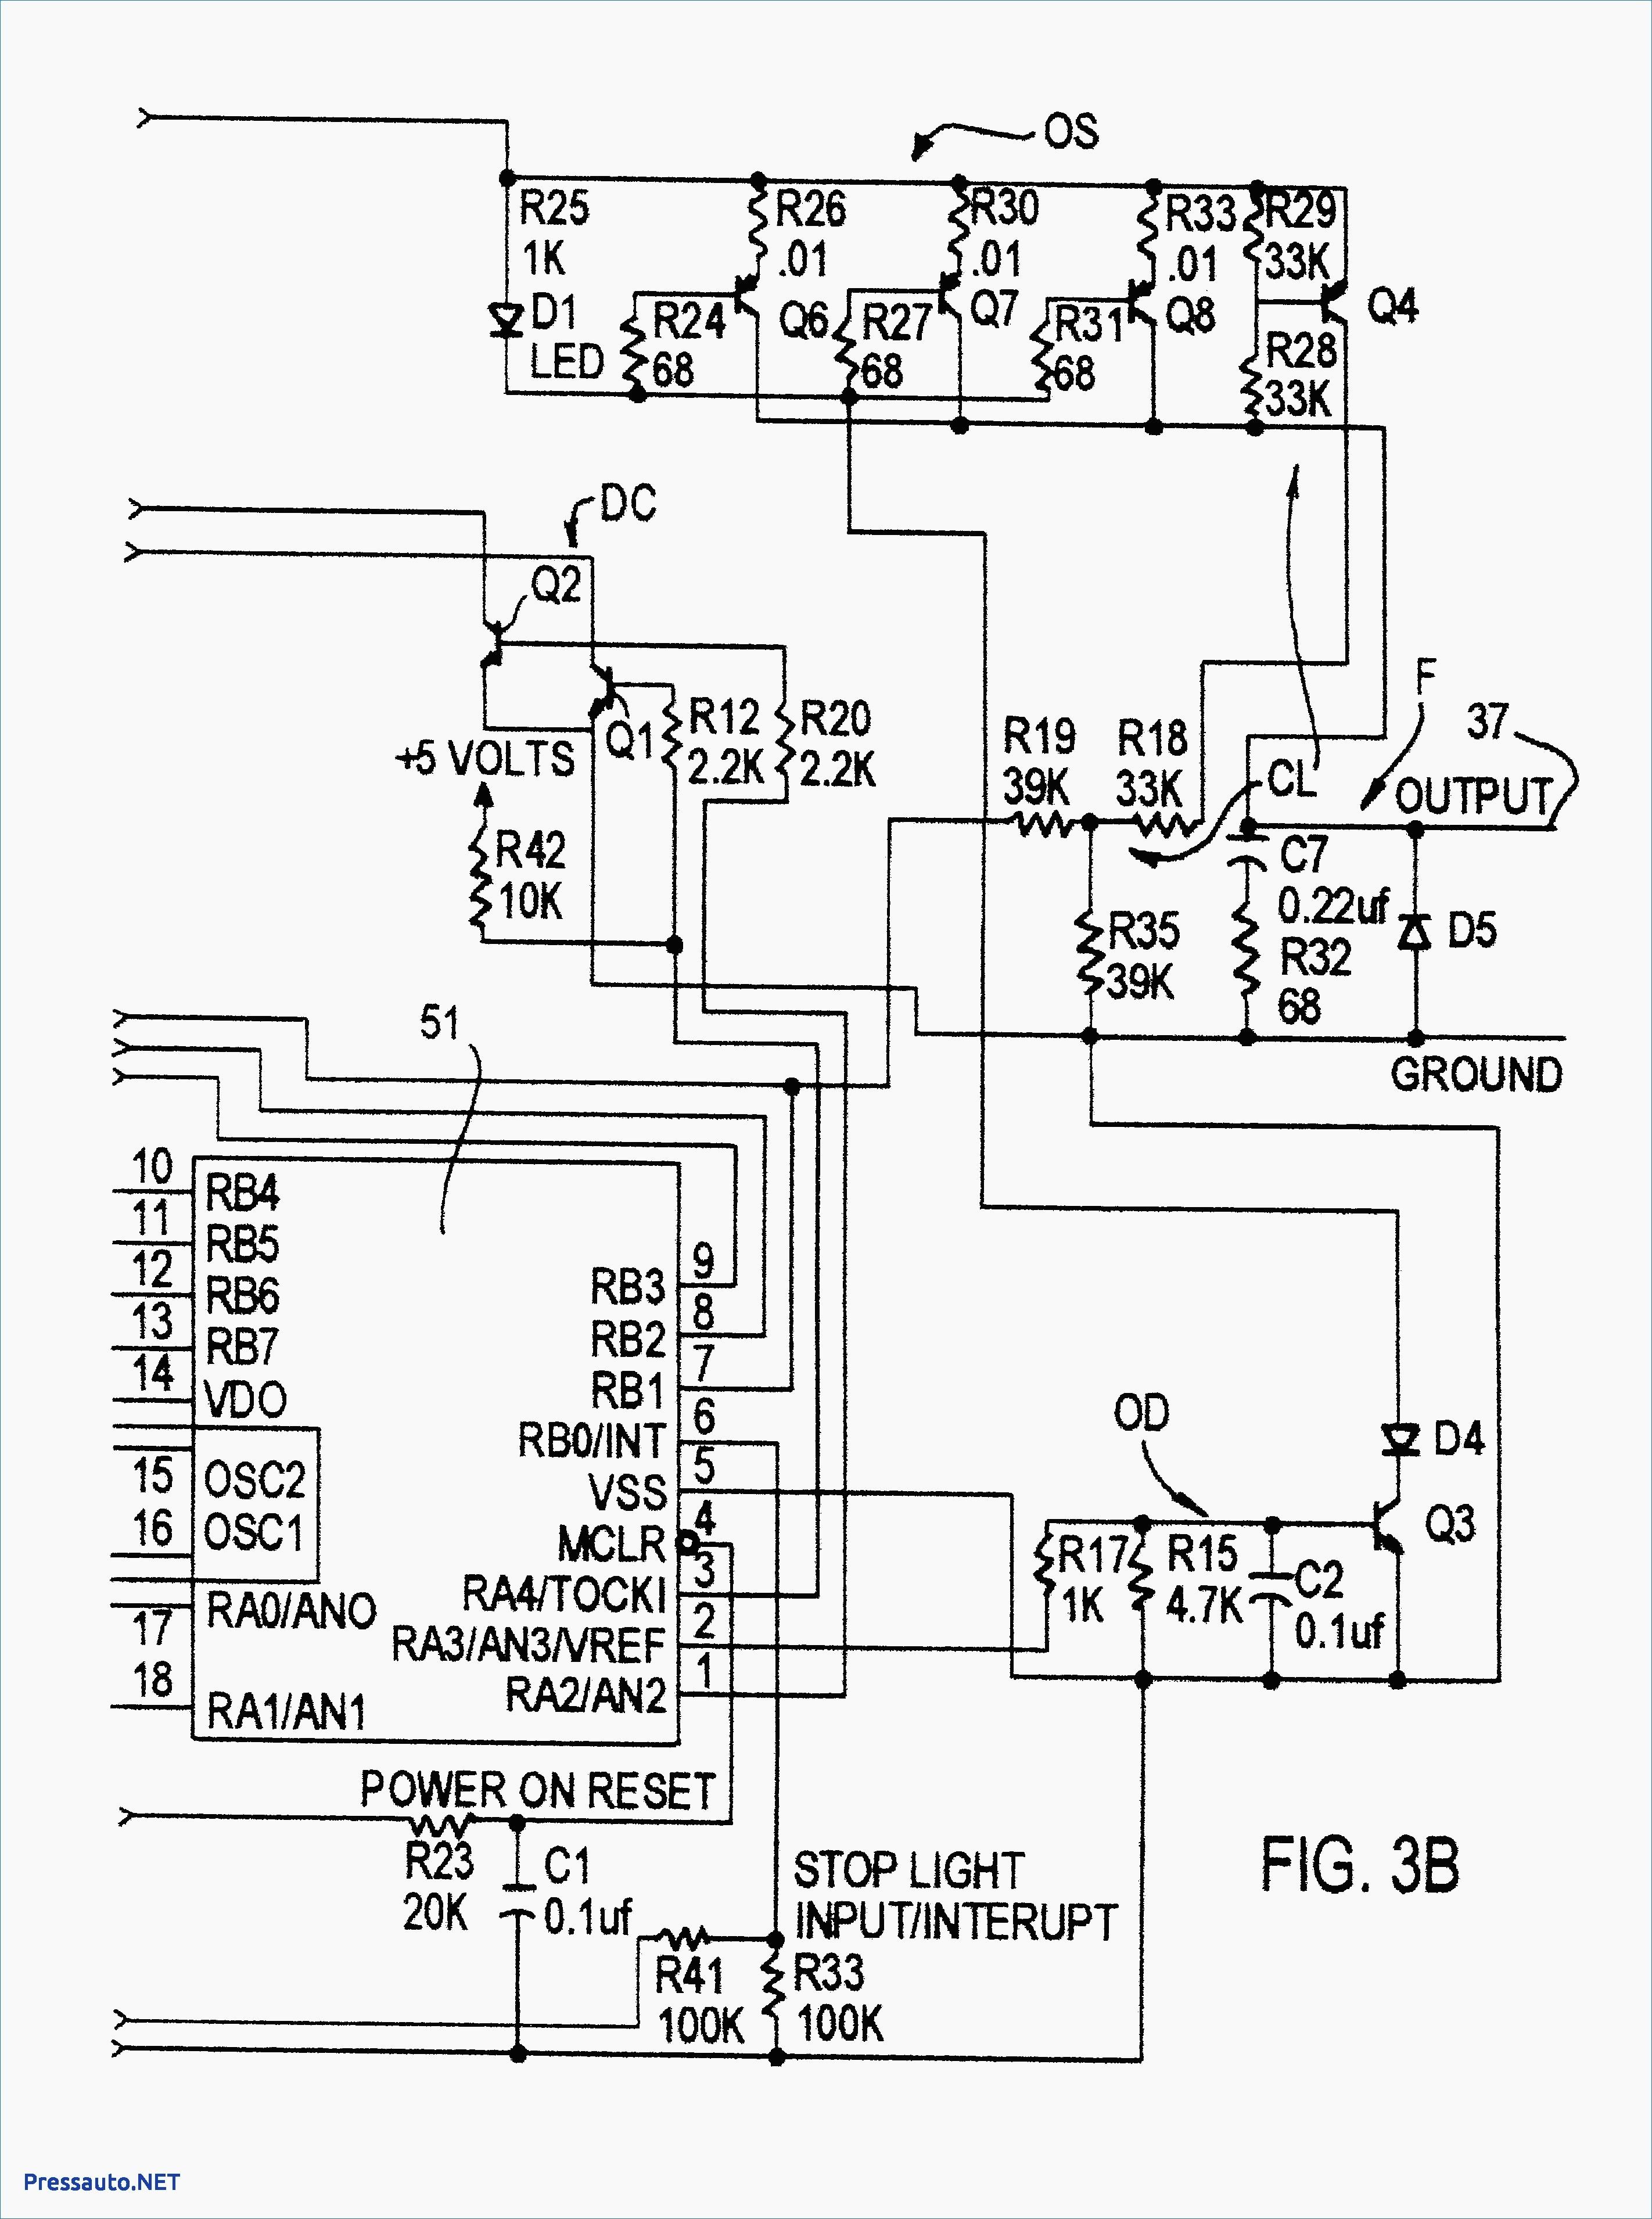 Stearns Brake Wiring Diagram | My Wiring DIagram